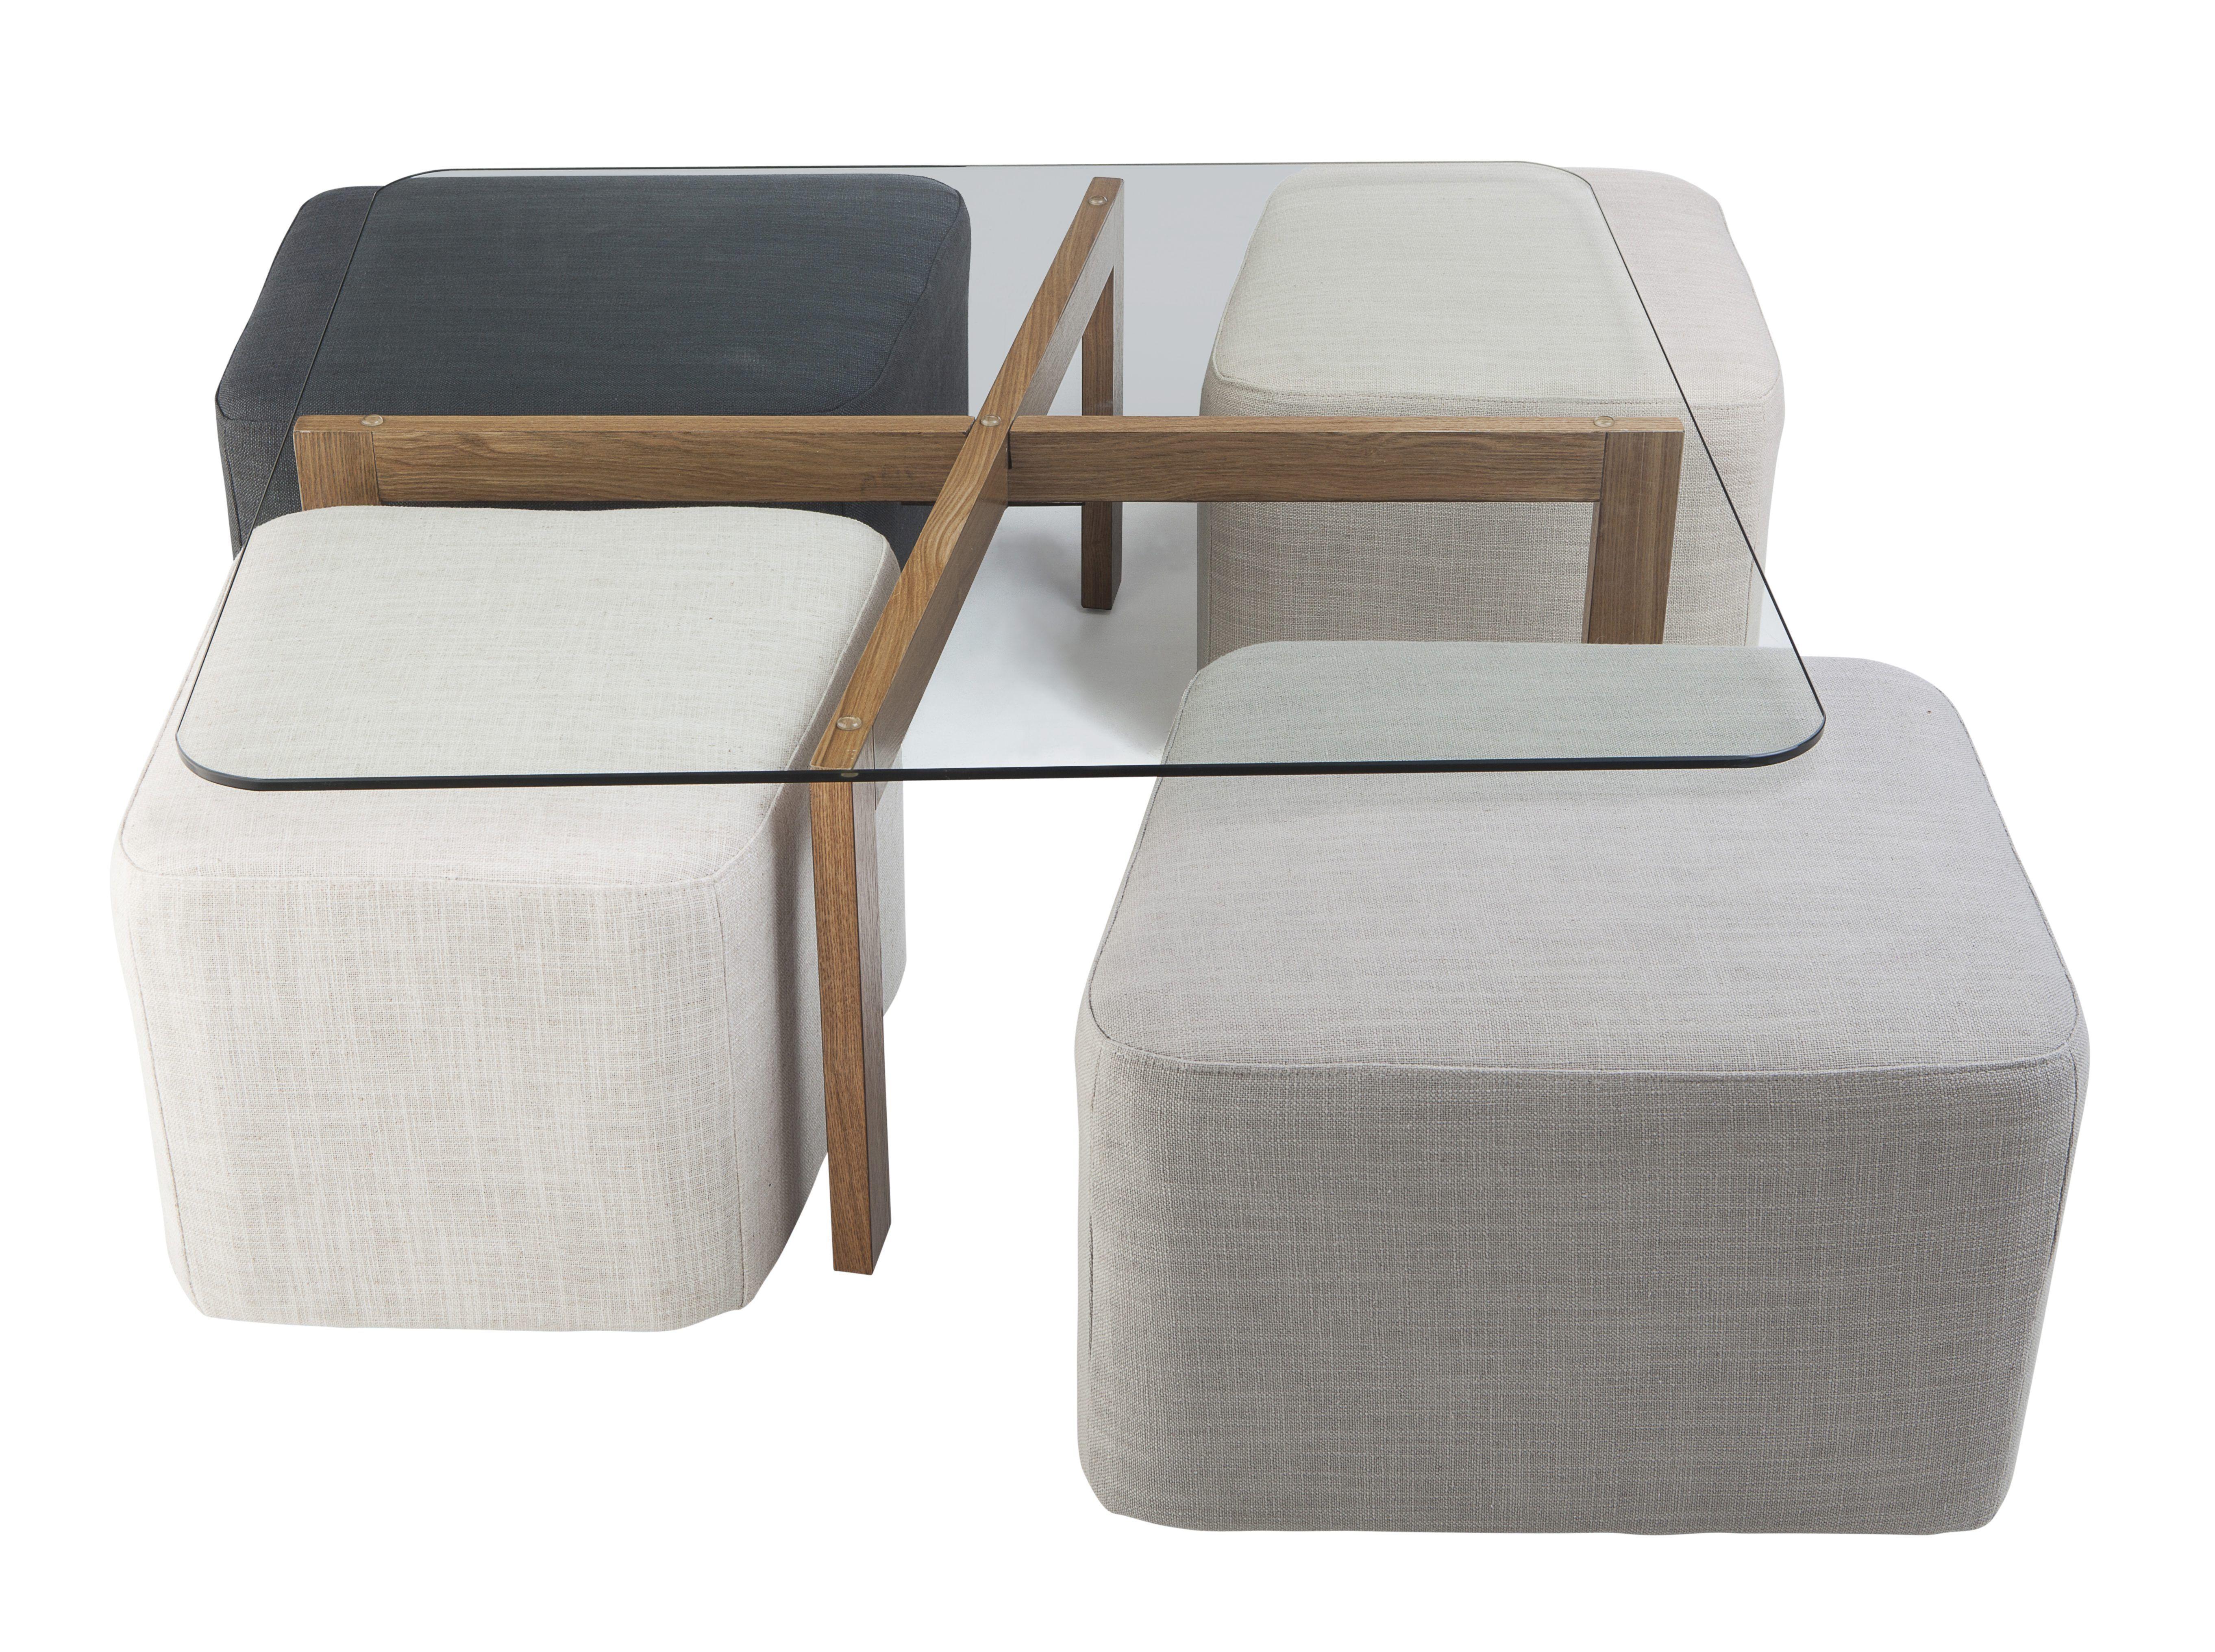 Table Basse Avec Pouf But.Table Basse Sahara Mobilier Furniture Table Basse Table